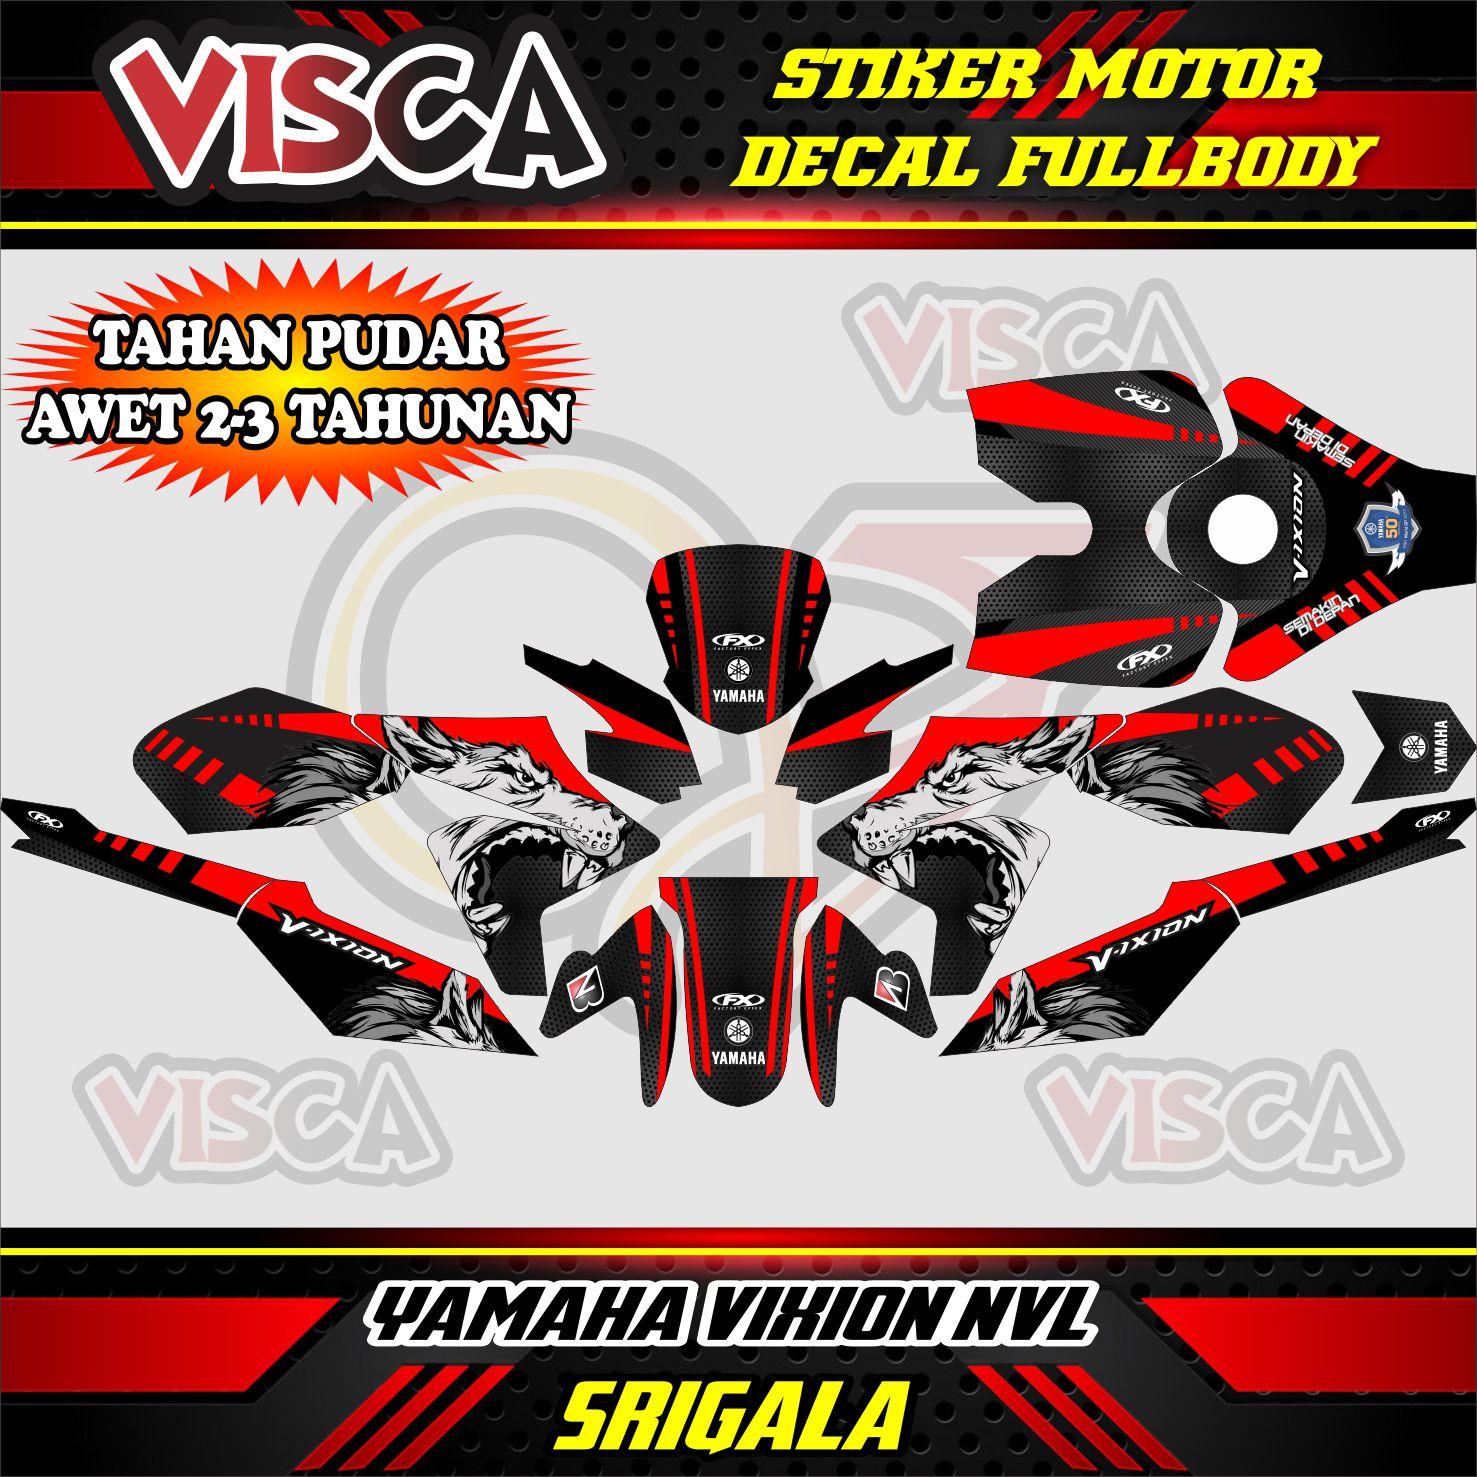 Dekal Vixion Stiker Motor Vixion New Stiker Motor New Vixion Stiker Motor Vixion 2014 Lazada Indonesia